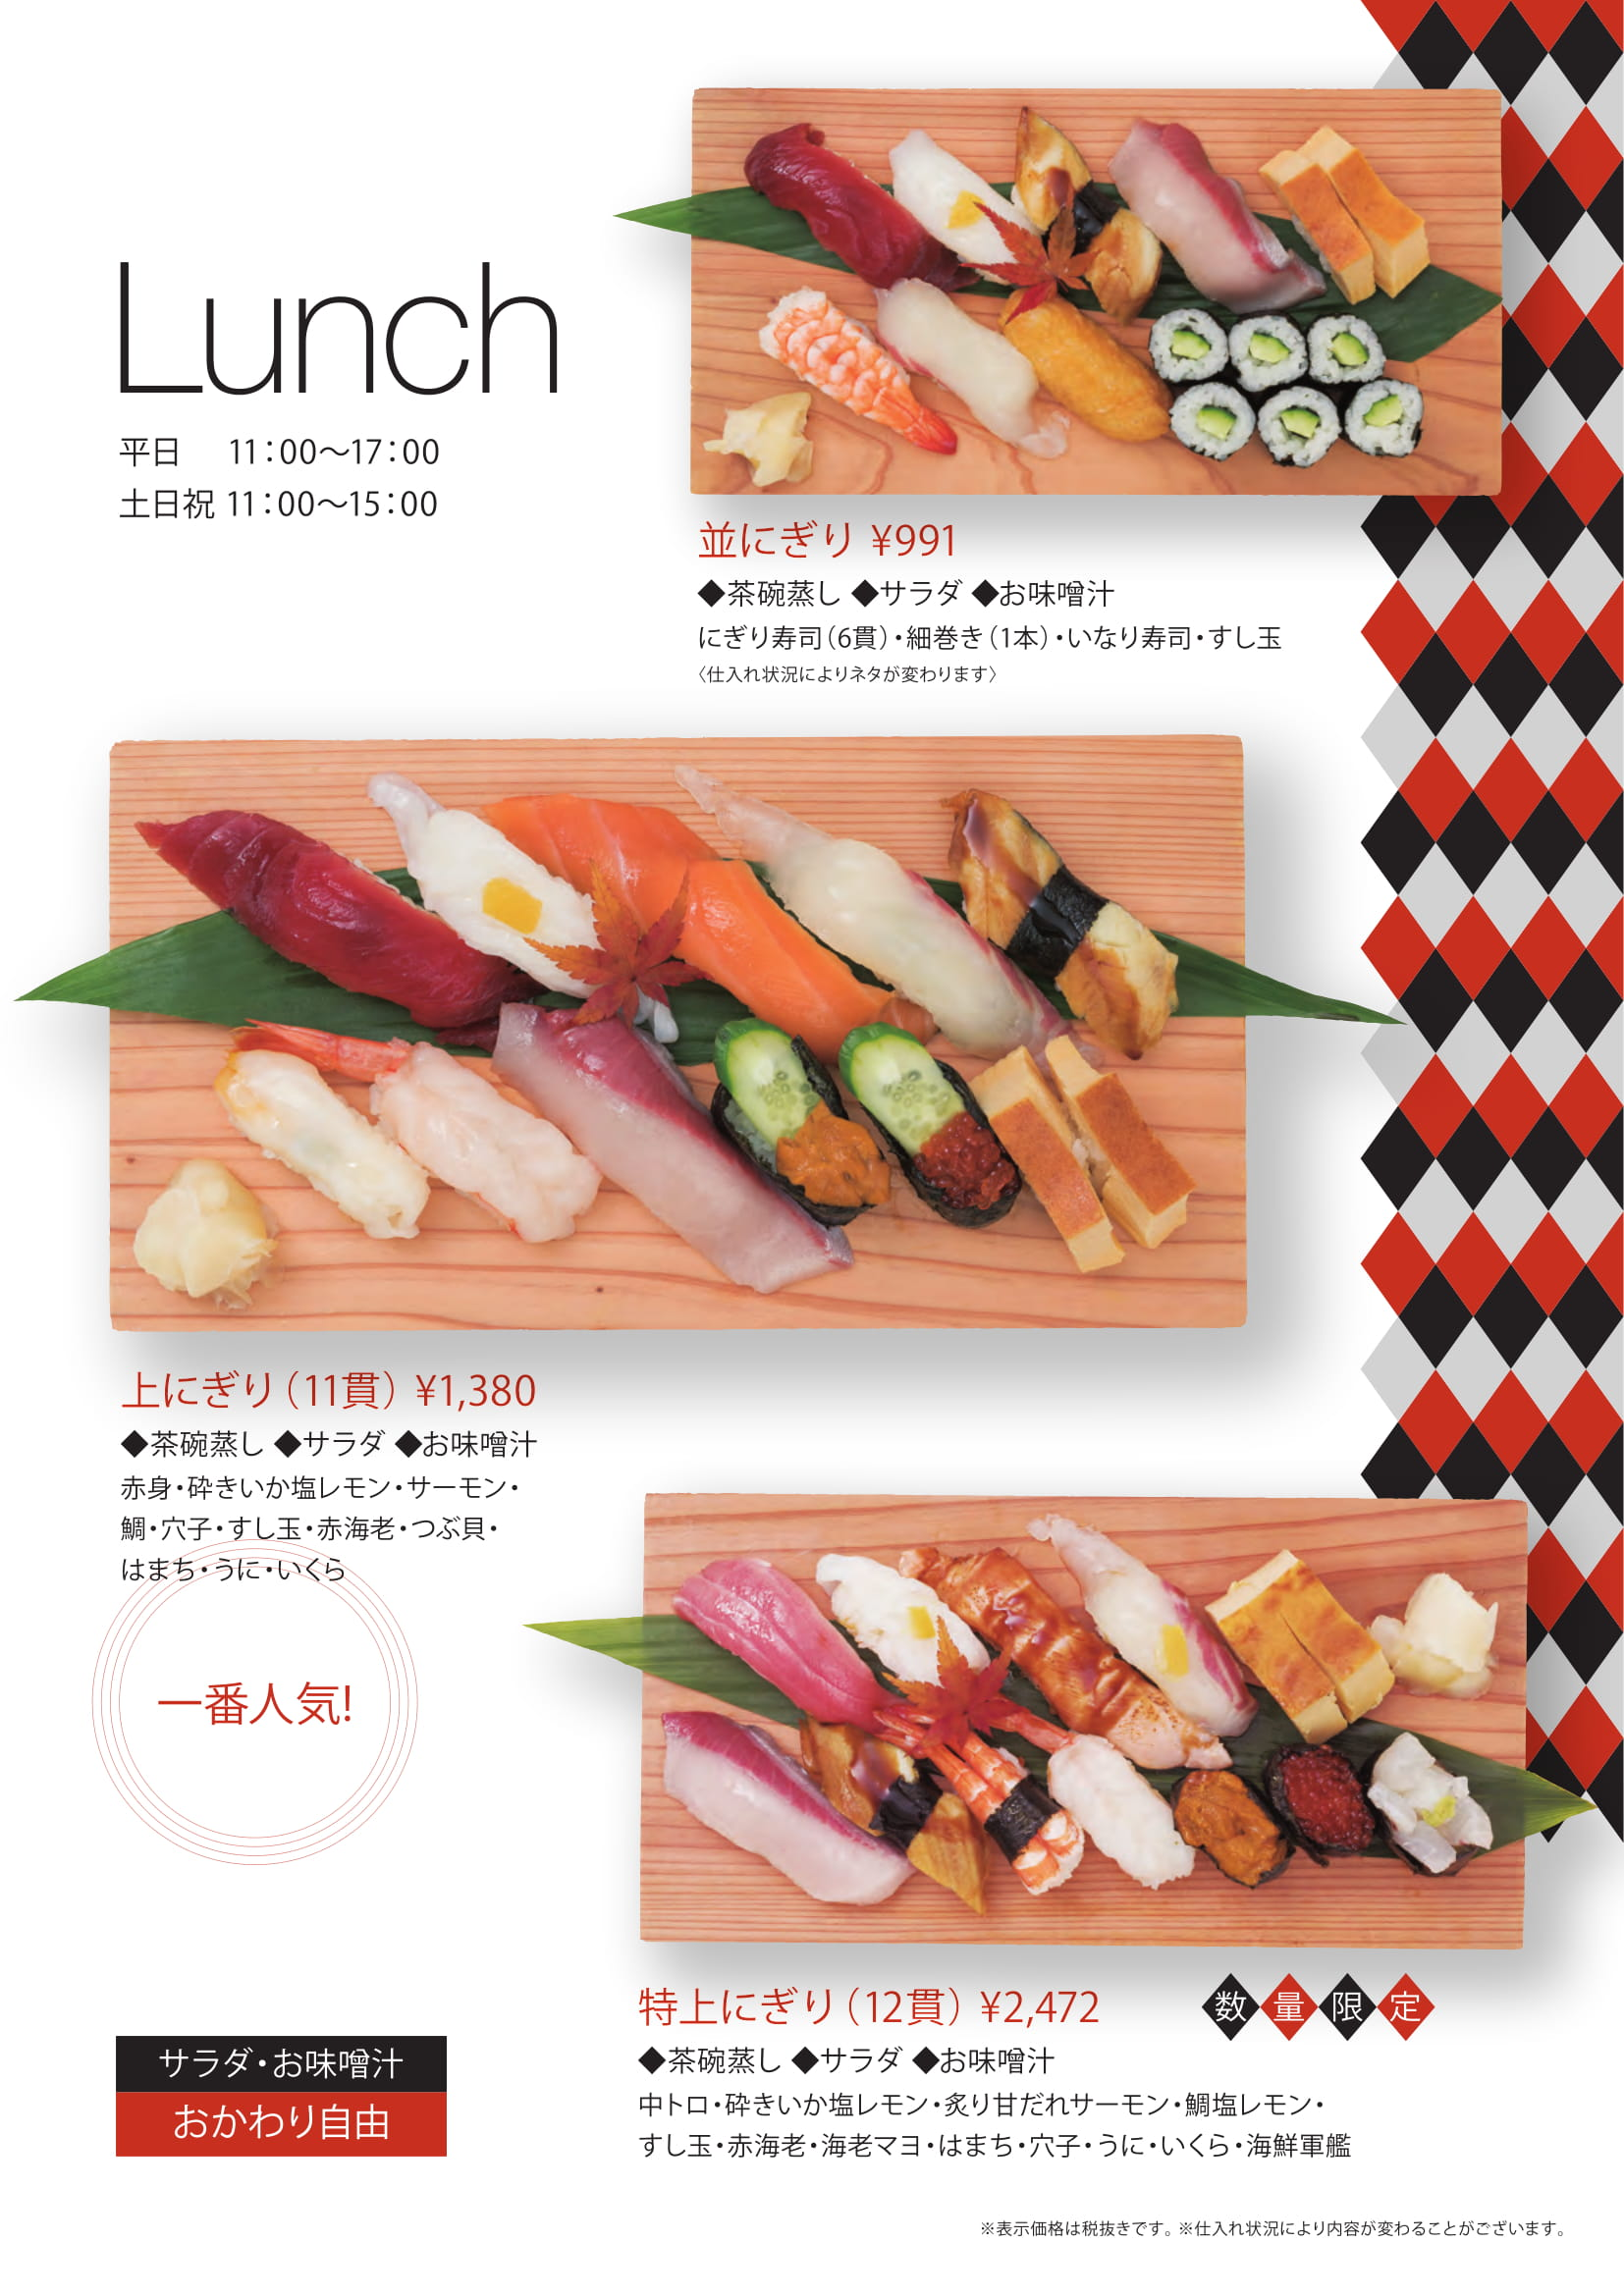 Japanese lunch edited-1.jpg